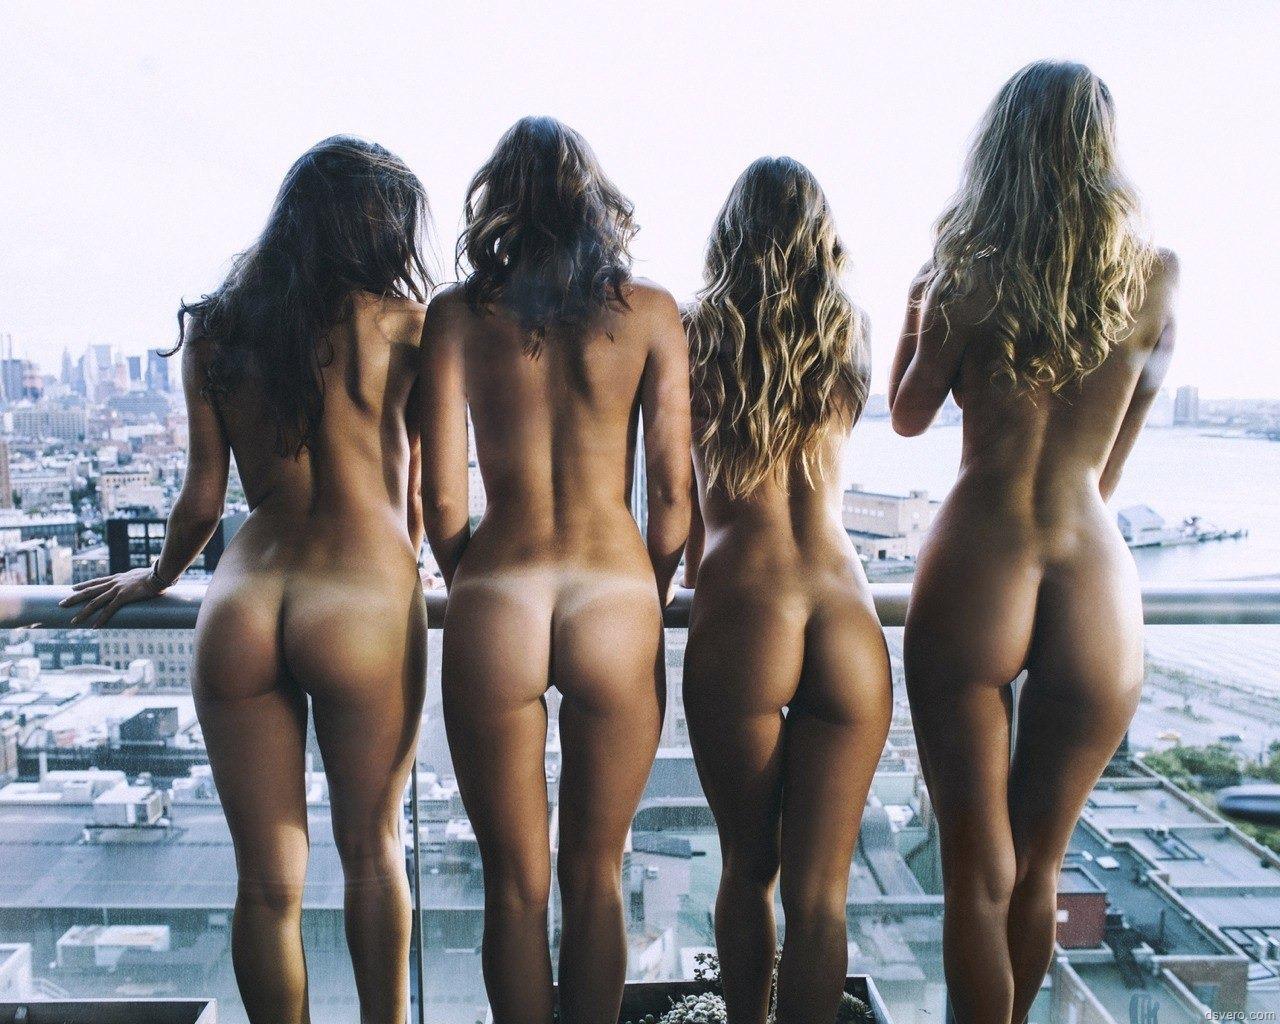 japanese bathing suit porn japanese bathing suit porn japanese swimsuit japanese #ass #bentover #bottomless #bottomless #bum #dimples #feet #feet #gap #gorgeous #greatass #nicelegs #partlyclothed #psfb #roundass #softfocus #waist